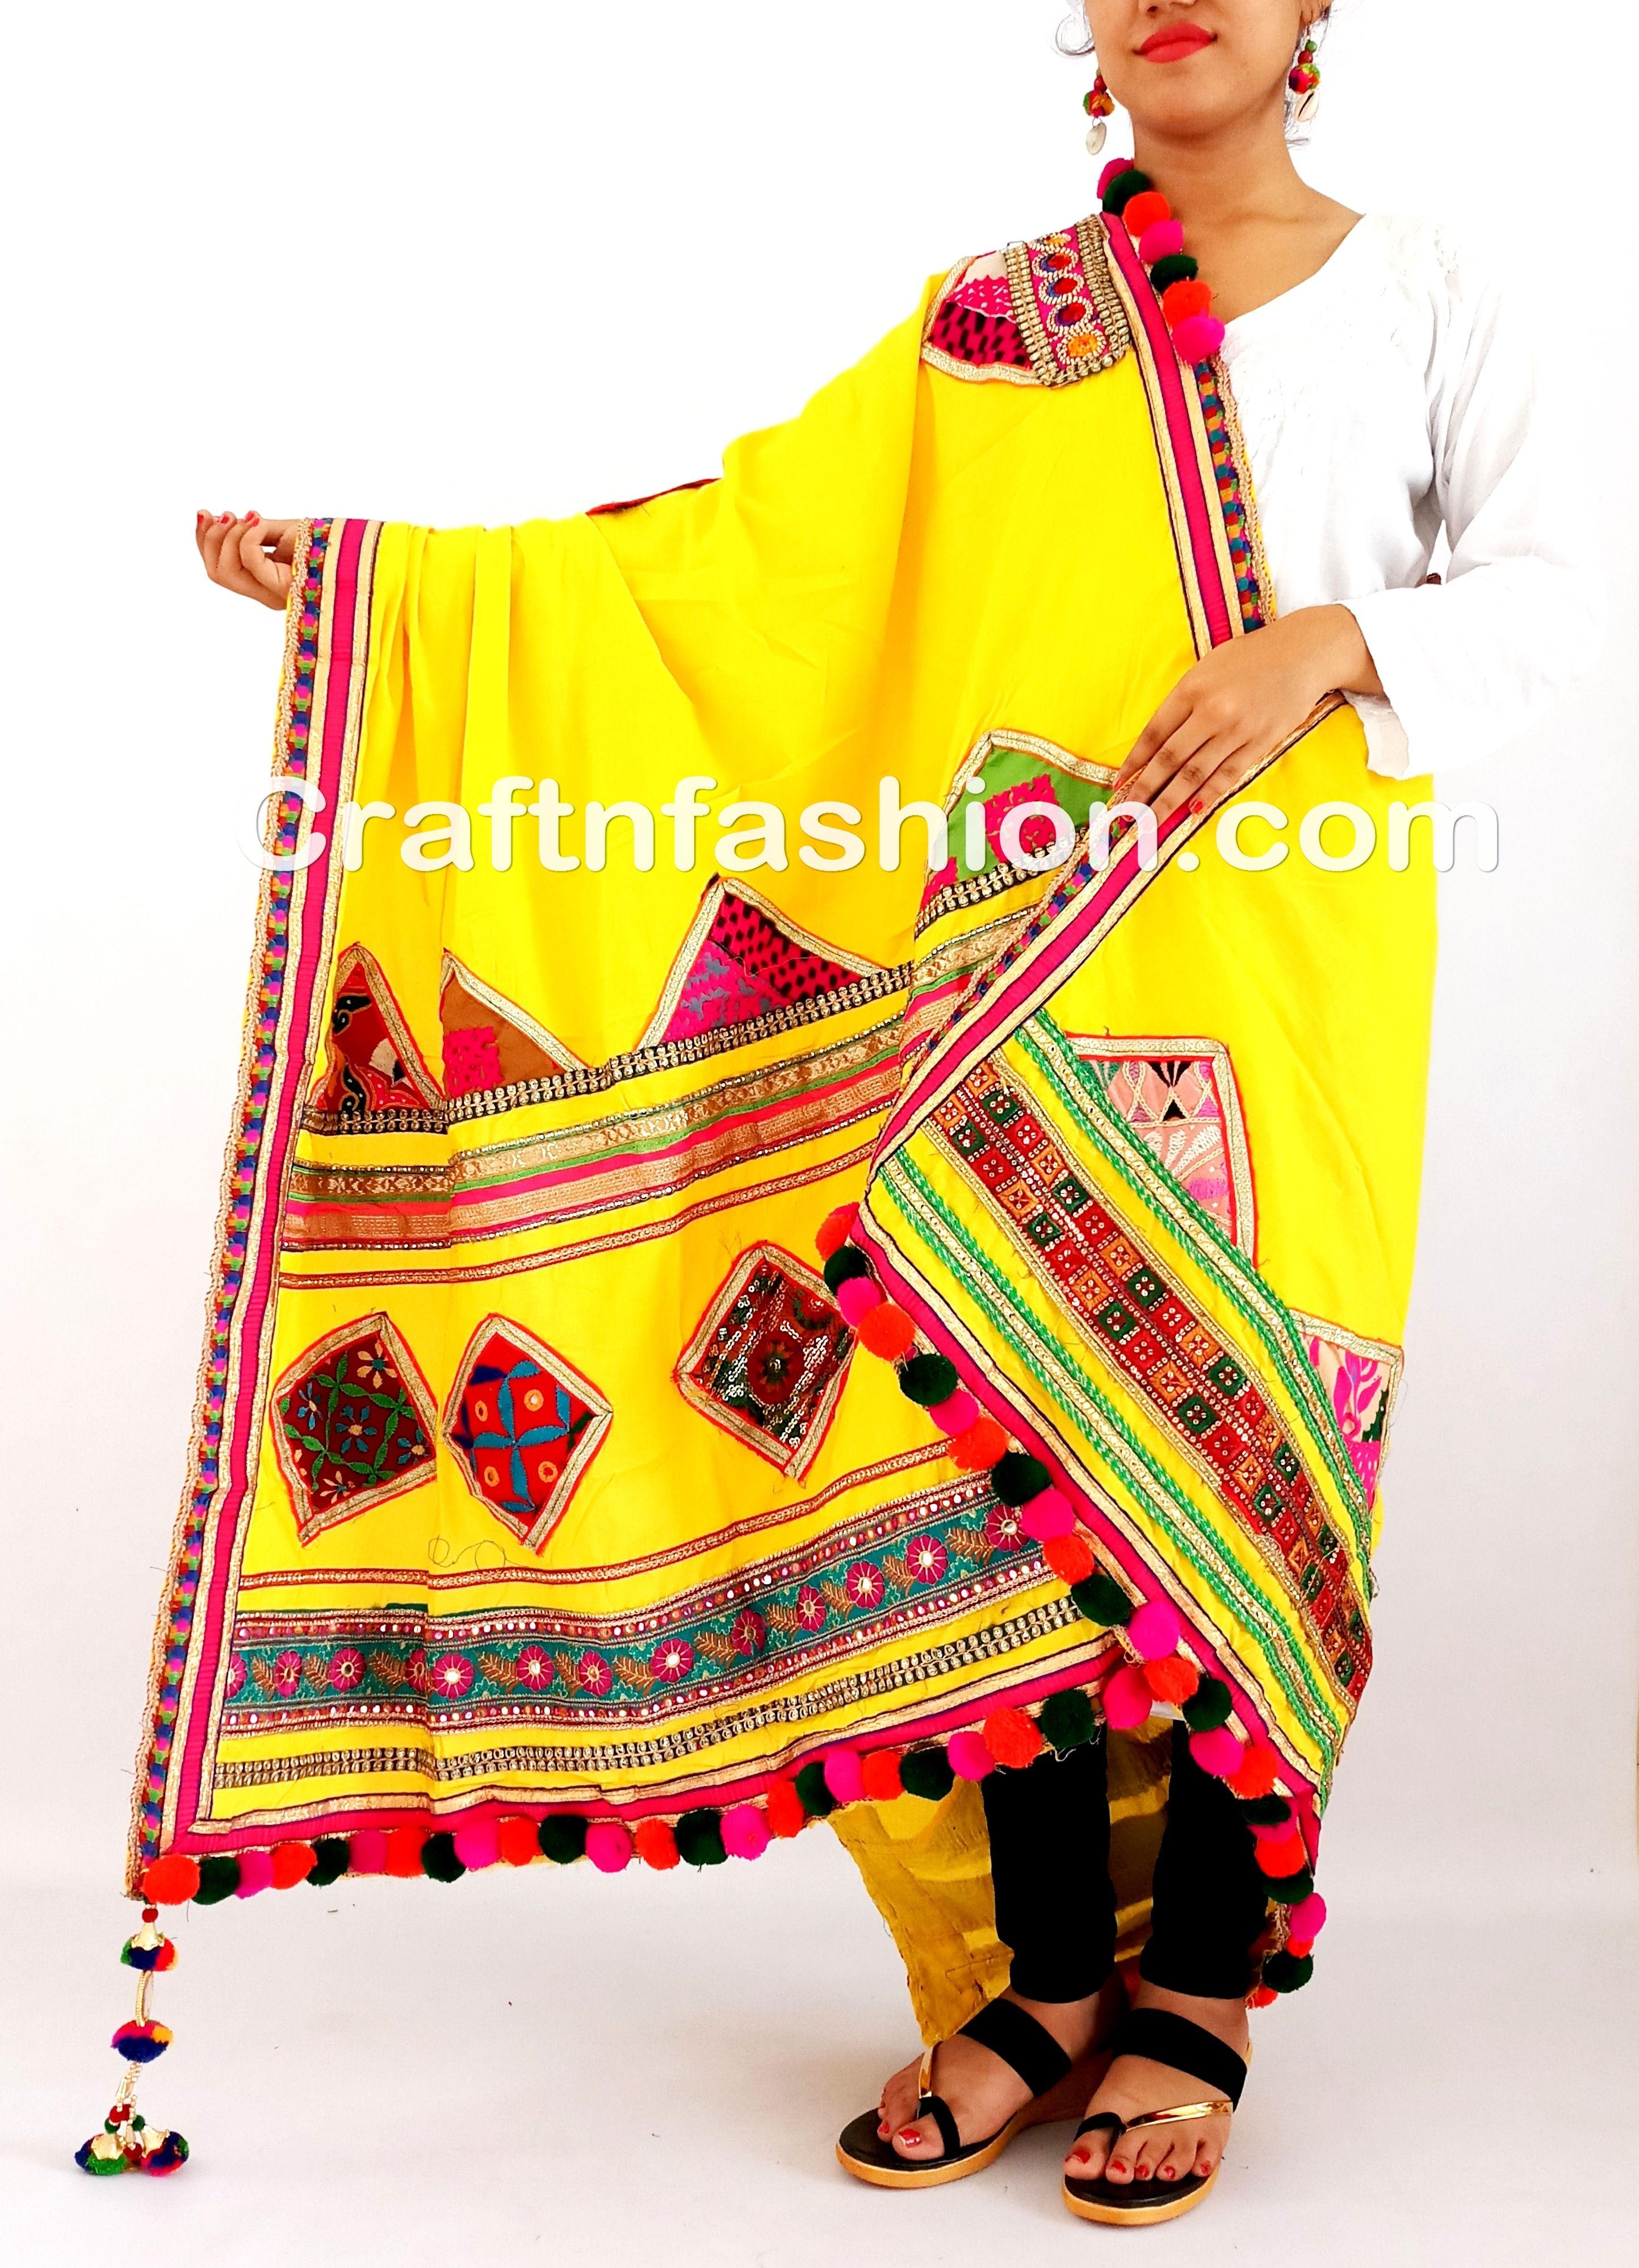 Kutch Embroidery Banjara Dupatta Cotton Kutch Dupatta With Beautiful Thread Work